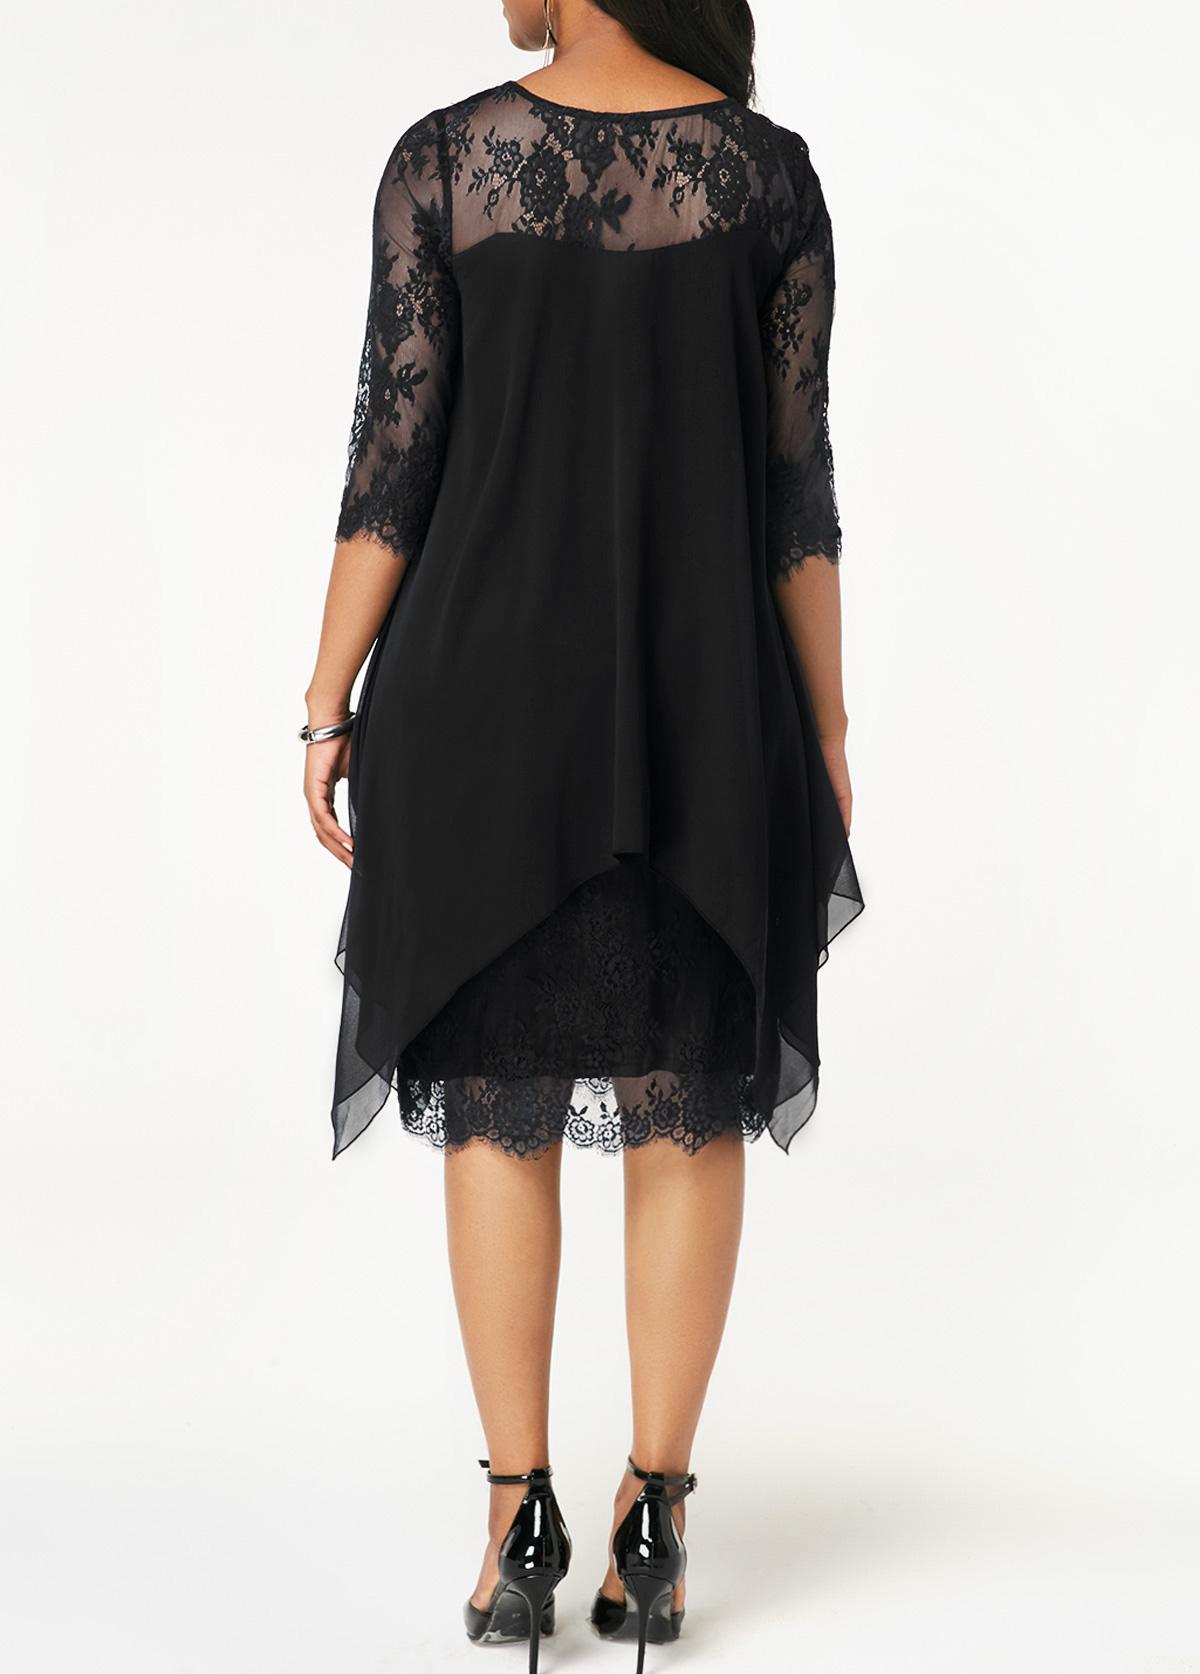 Chiffon Overlay Black Three Quarter Sleeve Lace Dress